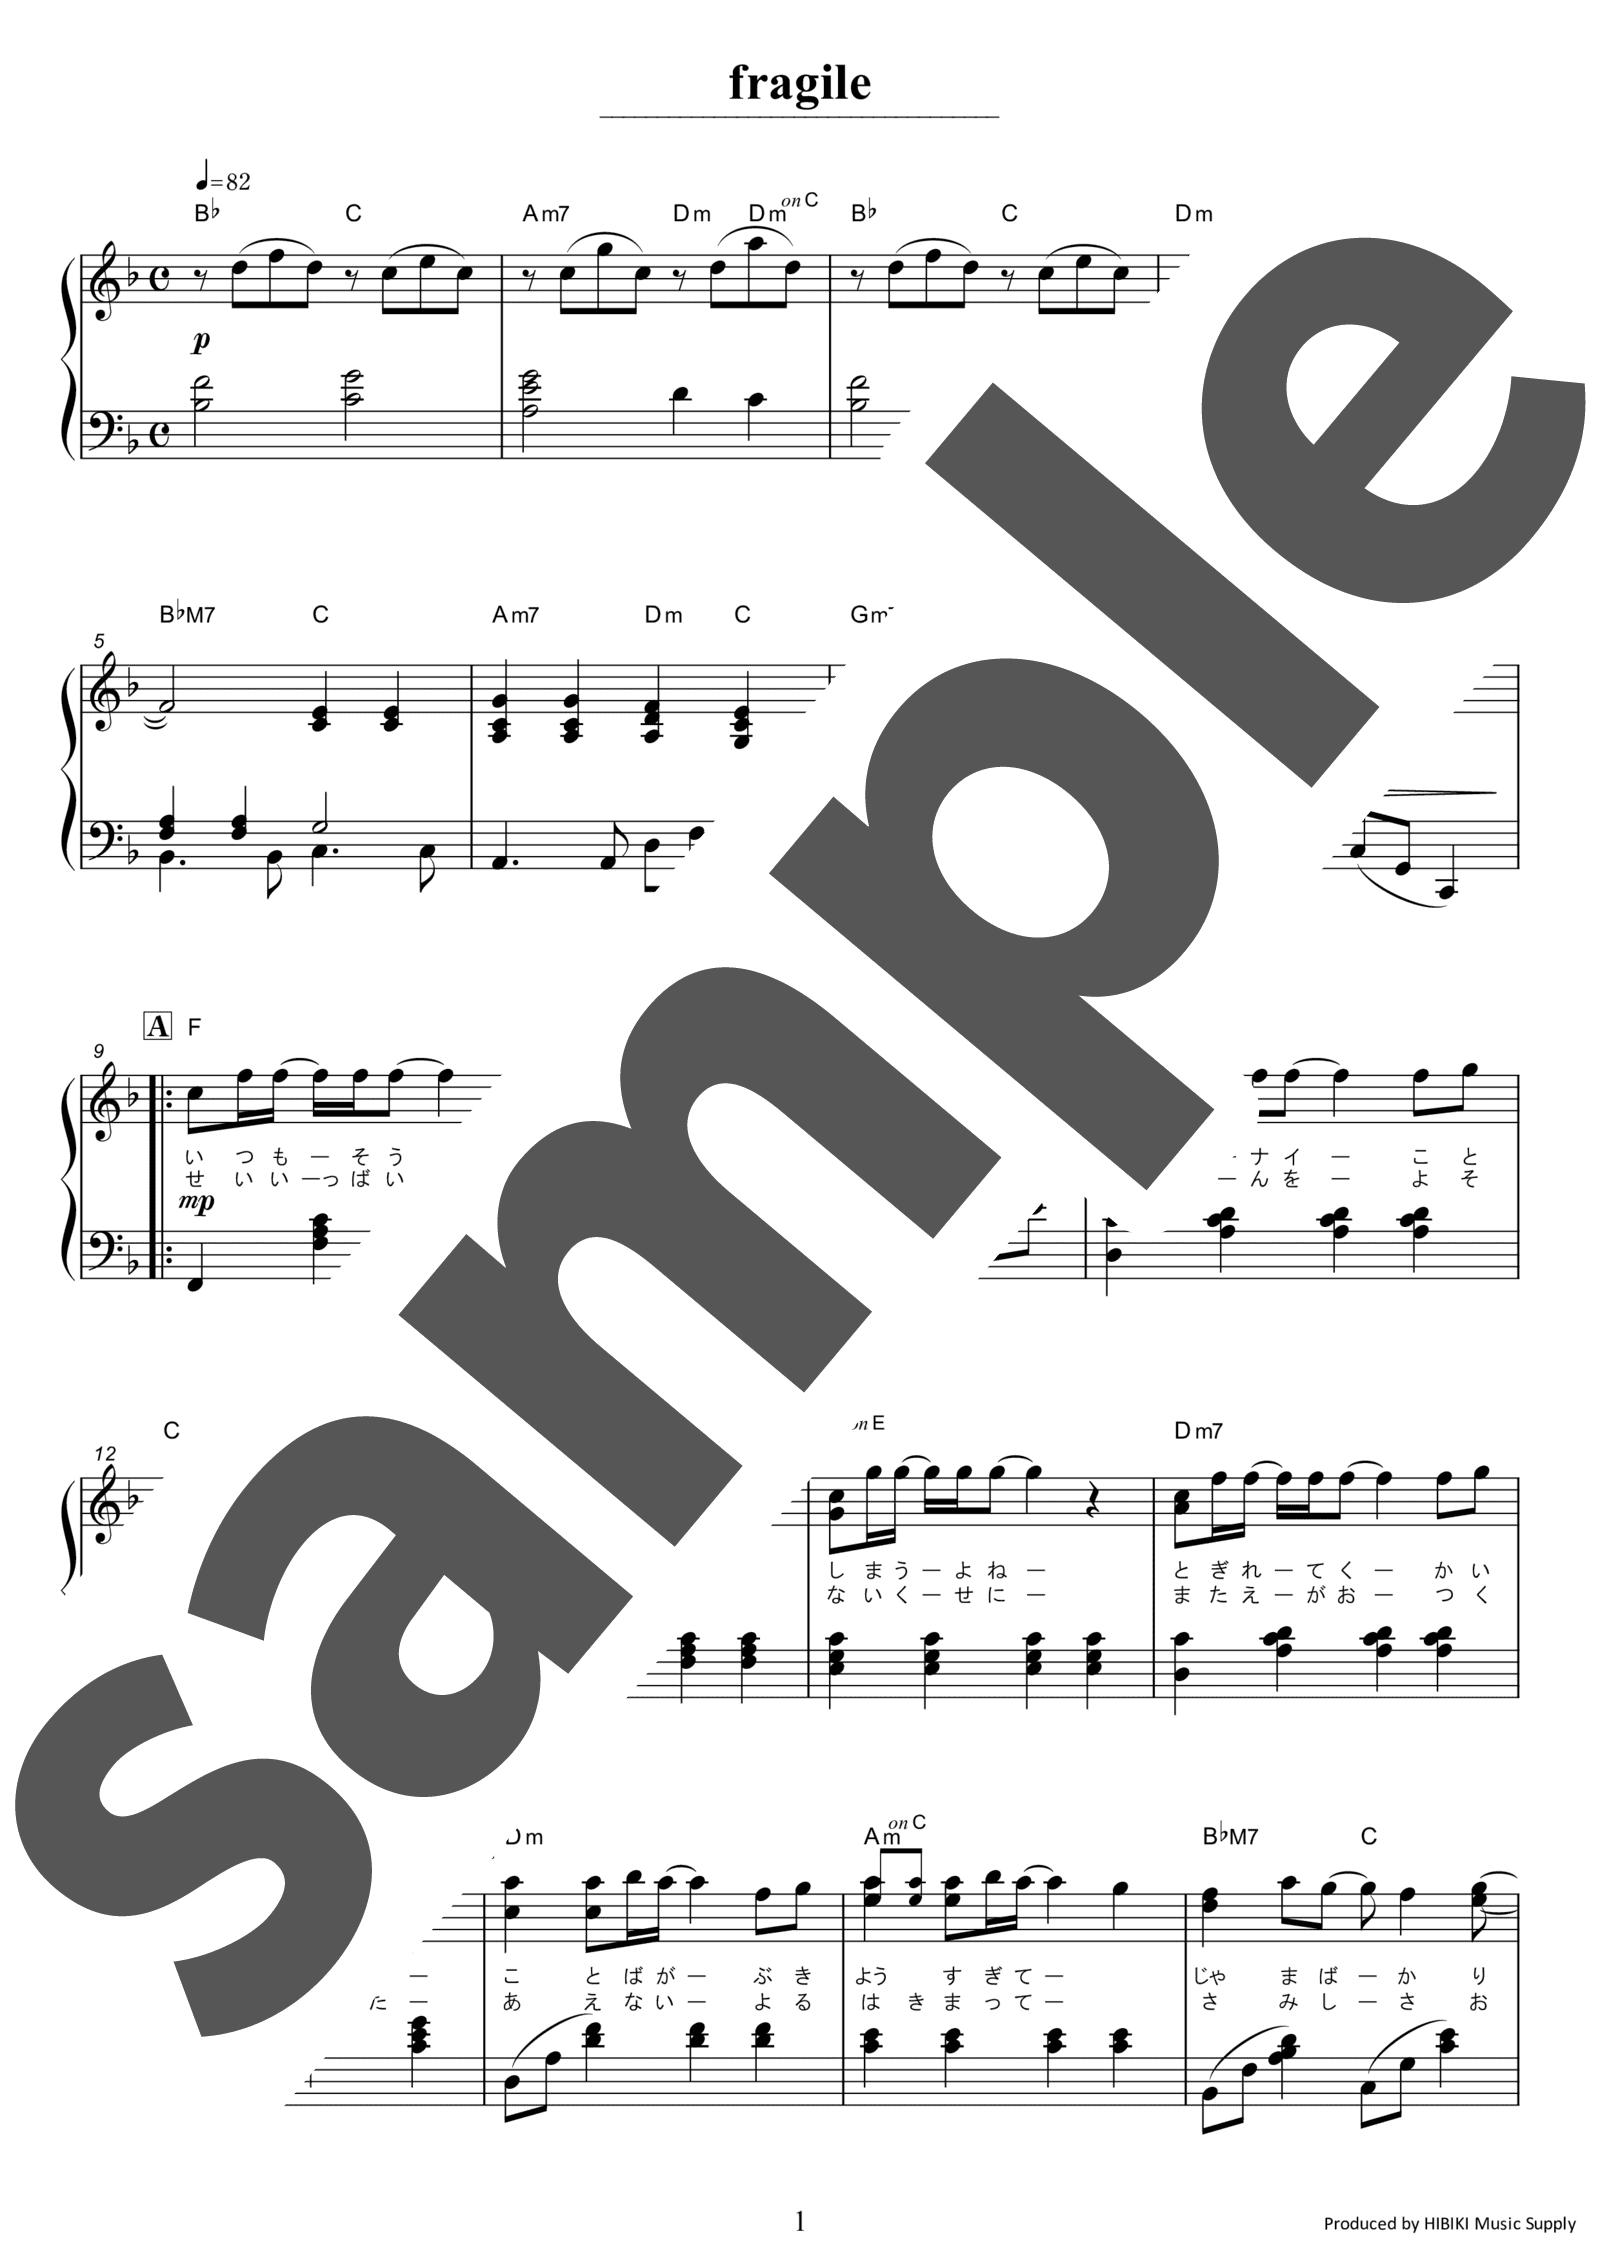 「fragile」のサンプル楽譜